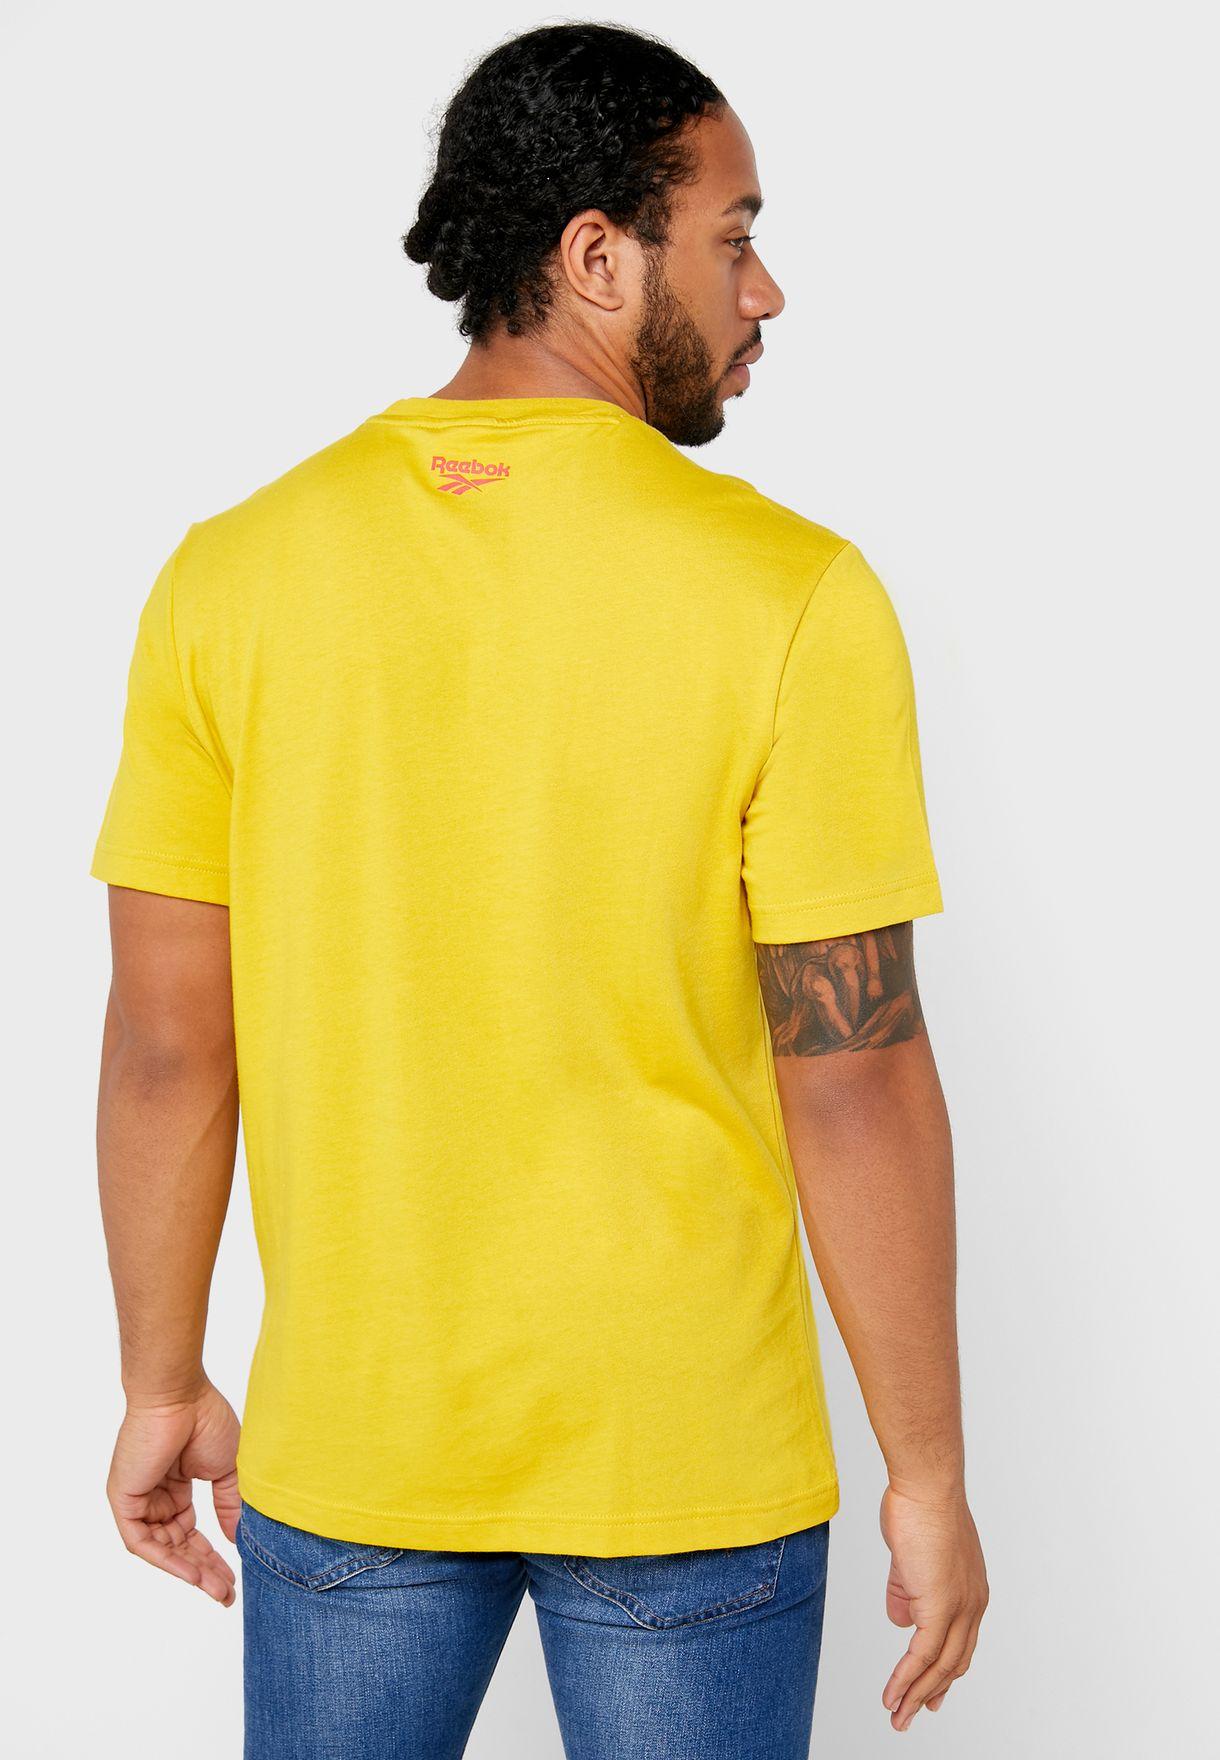 Classics International Tacos T-Shirt